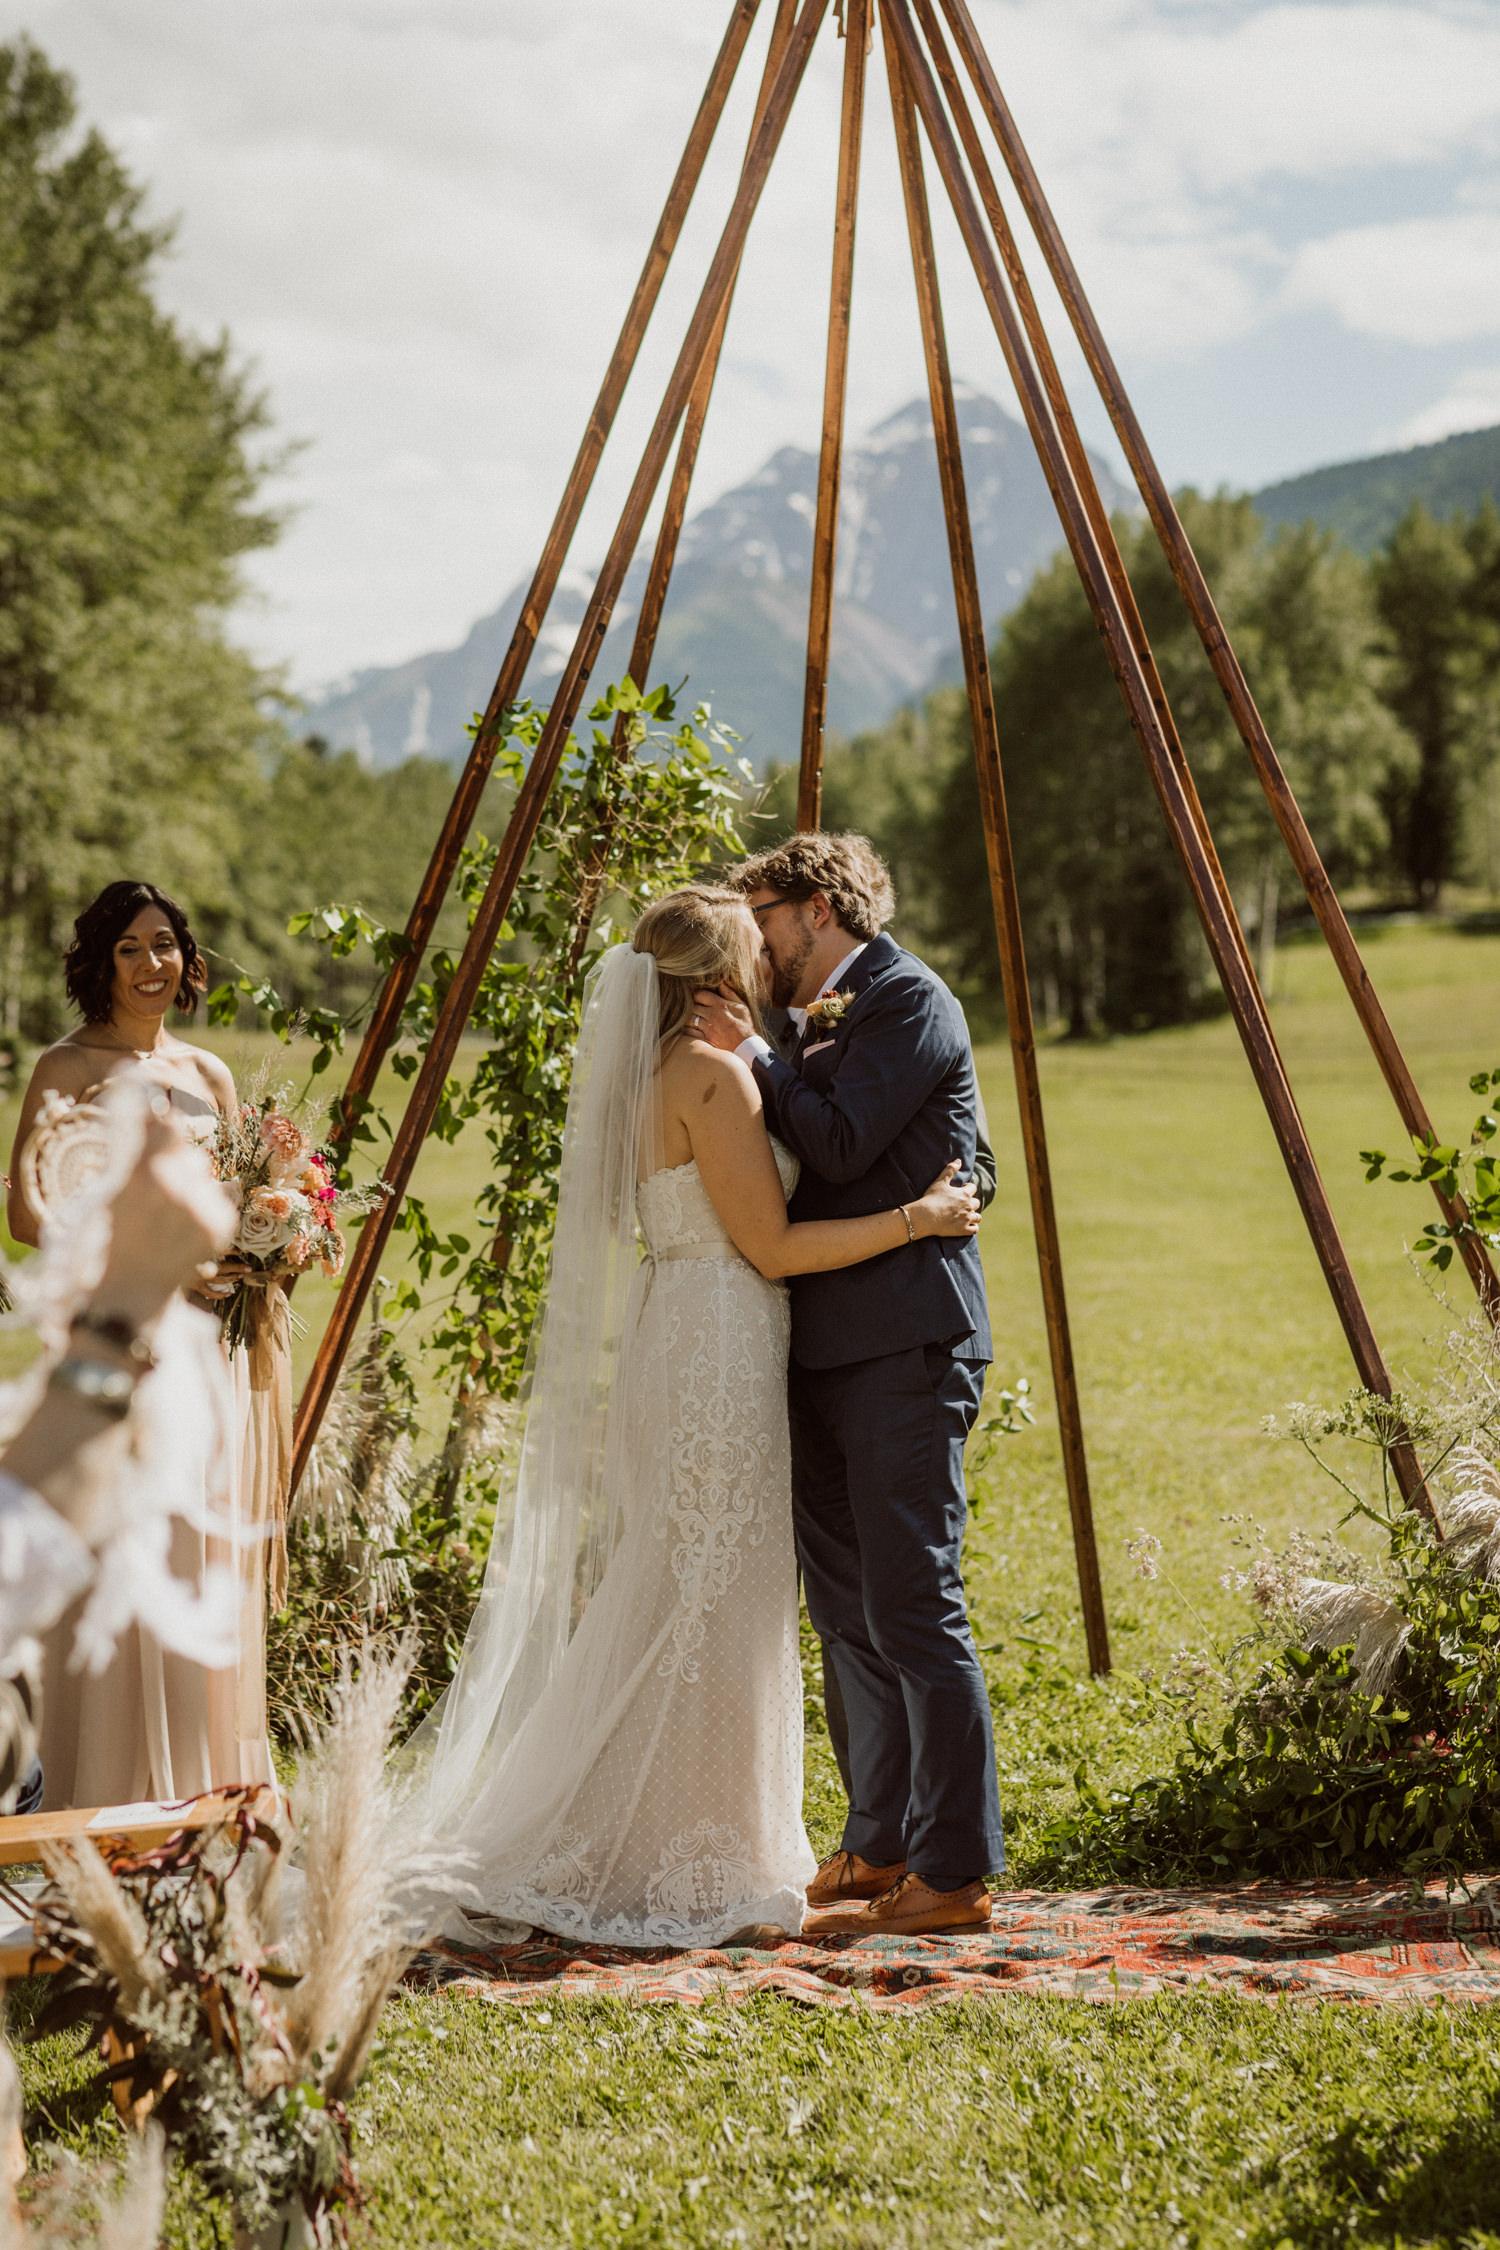 13_bohemian-wedding-in-aspen-colorado-16.jpg